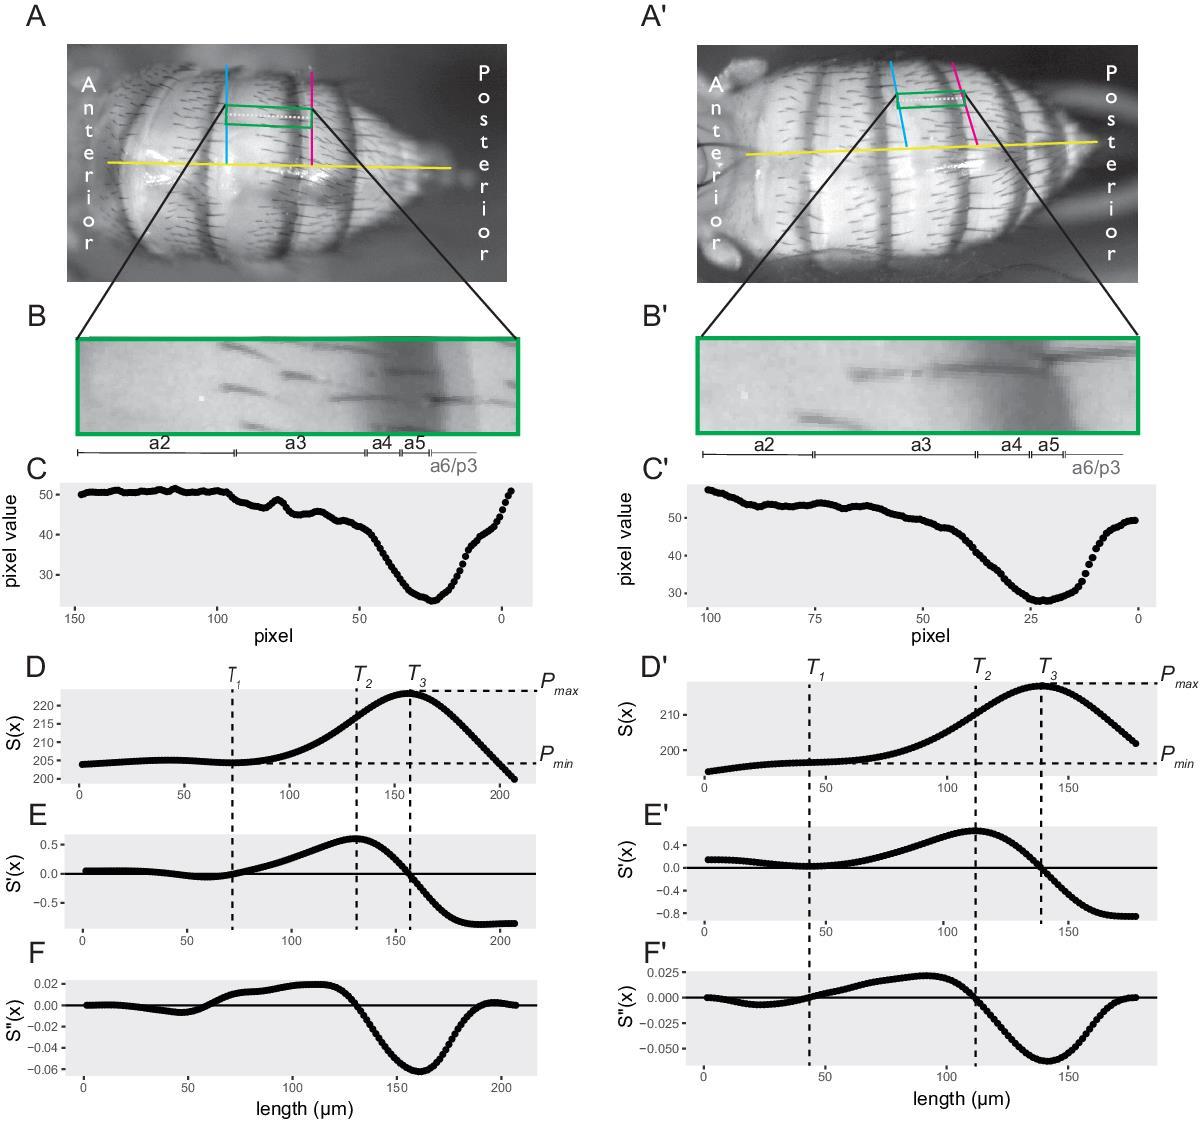 Quantifying Abdominal Pigmentation in Drosophila